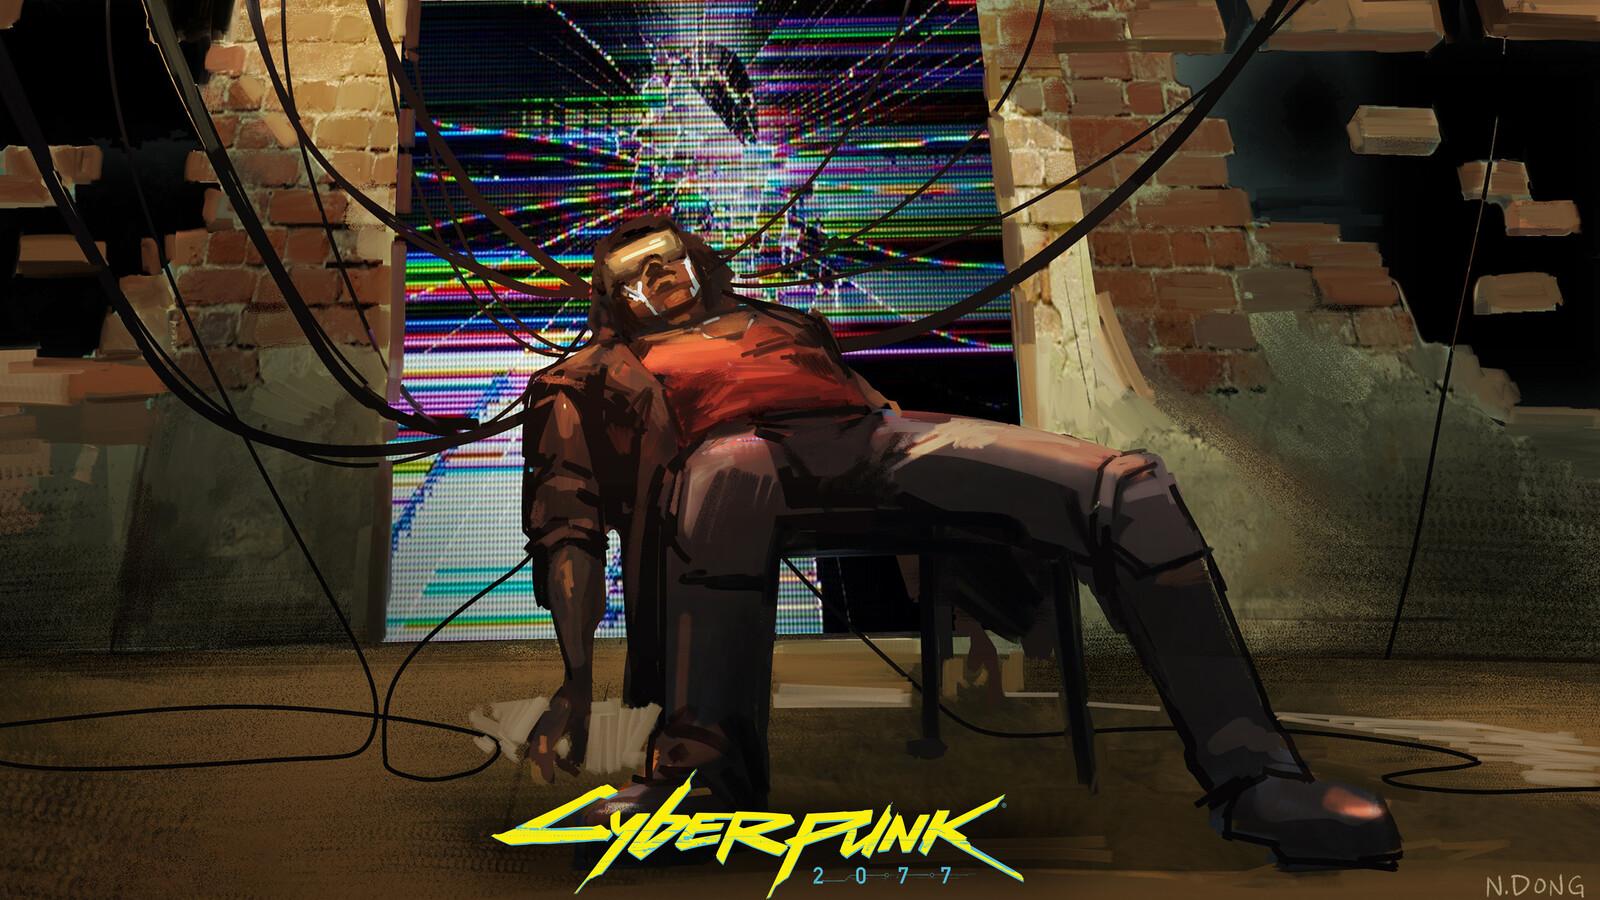 Cyberpunk 2077 - Plugged in